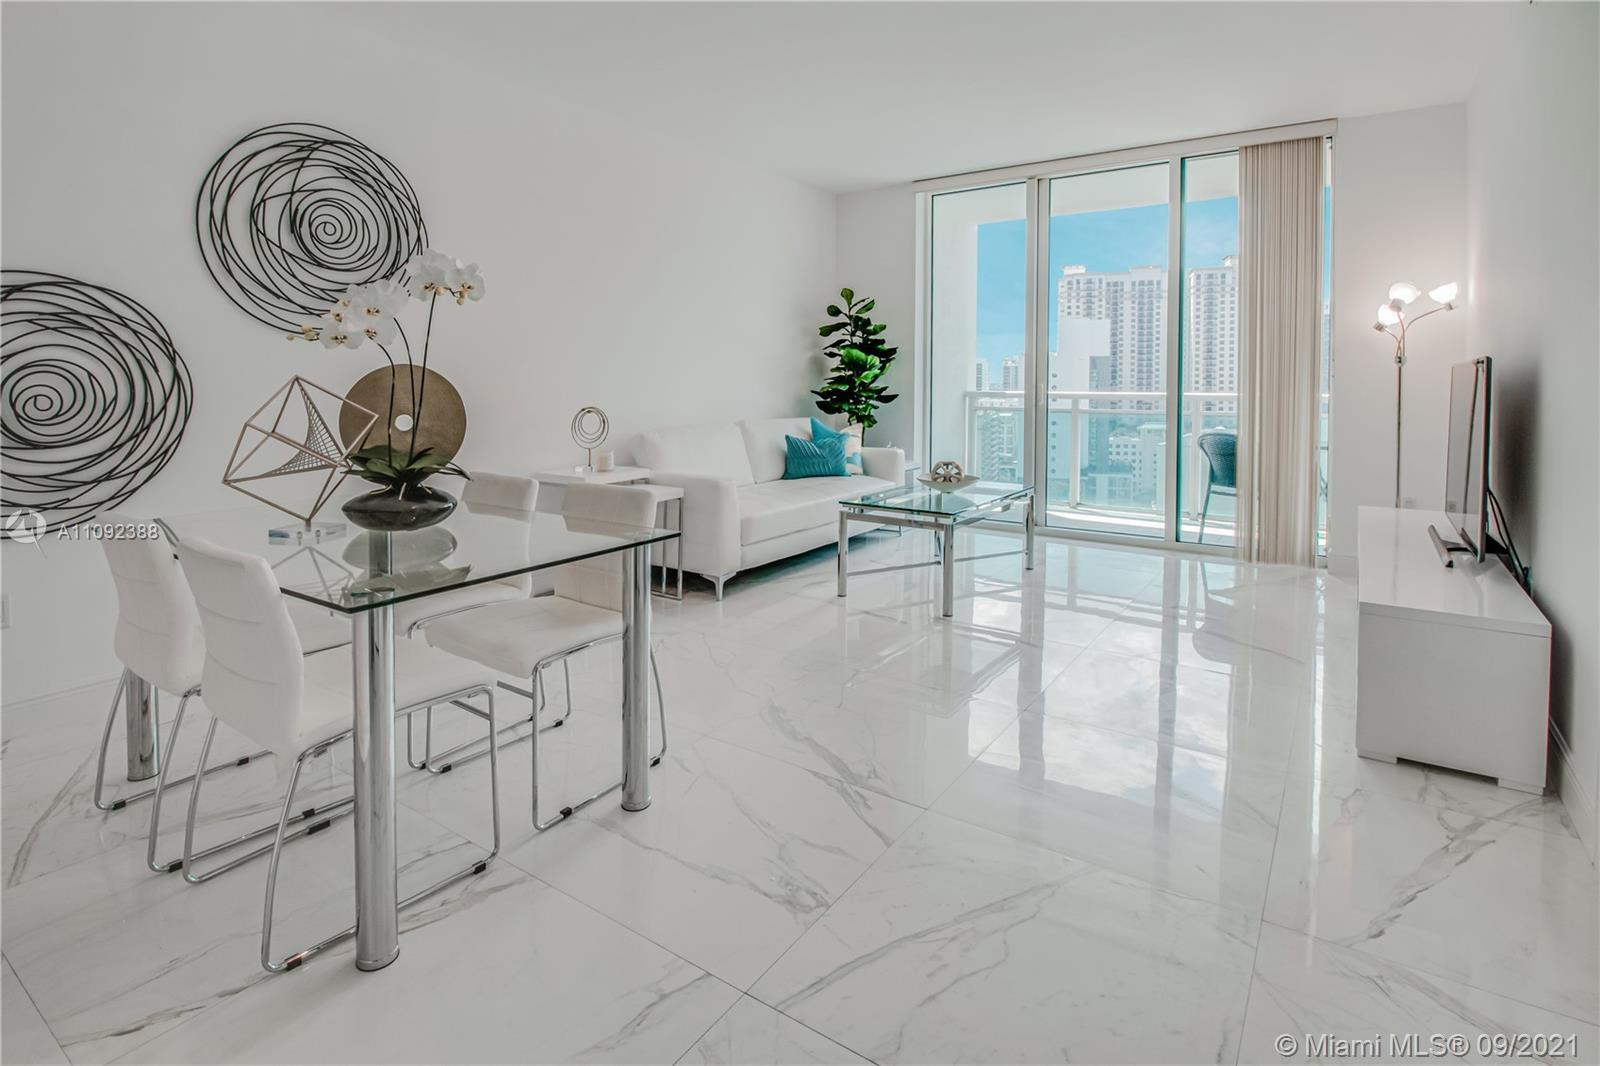 Live limitlessly in this delightful 20th floor unit at The Plaza overlooking prestigious Brickell Av